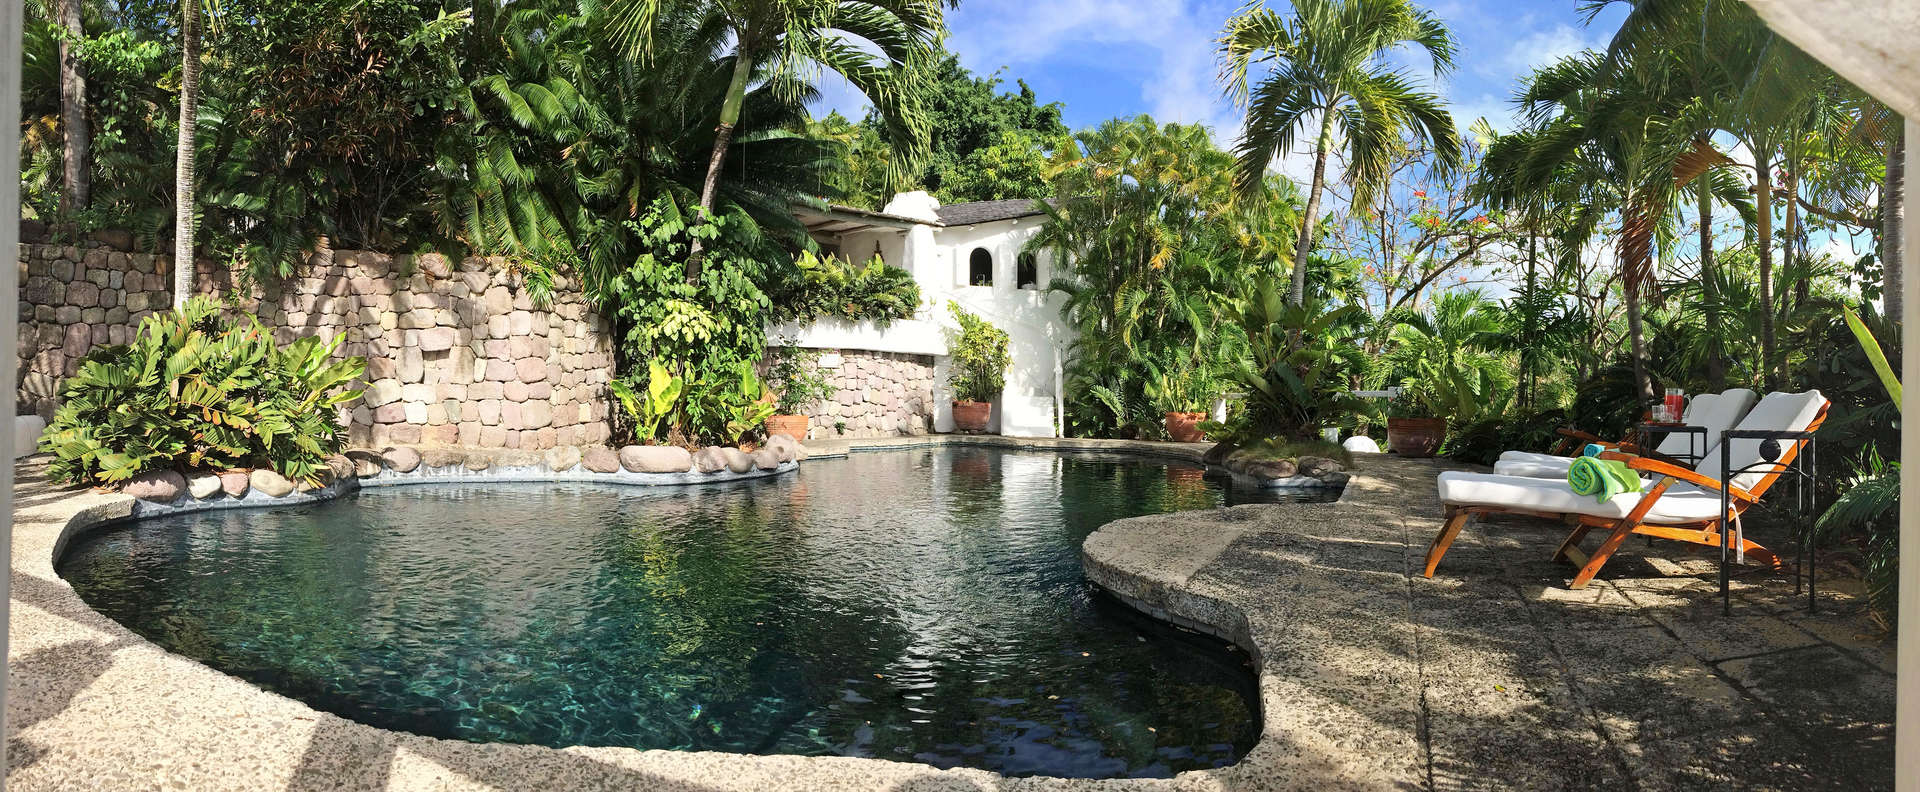 Luxury villa rentals caribbean - St lucia - Cap estate sl - Smugglers  cove - Smuggler's Nest - Image 1/14